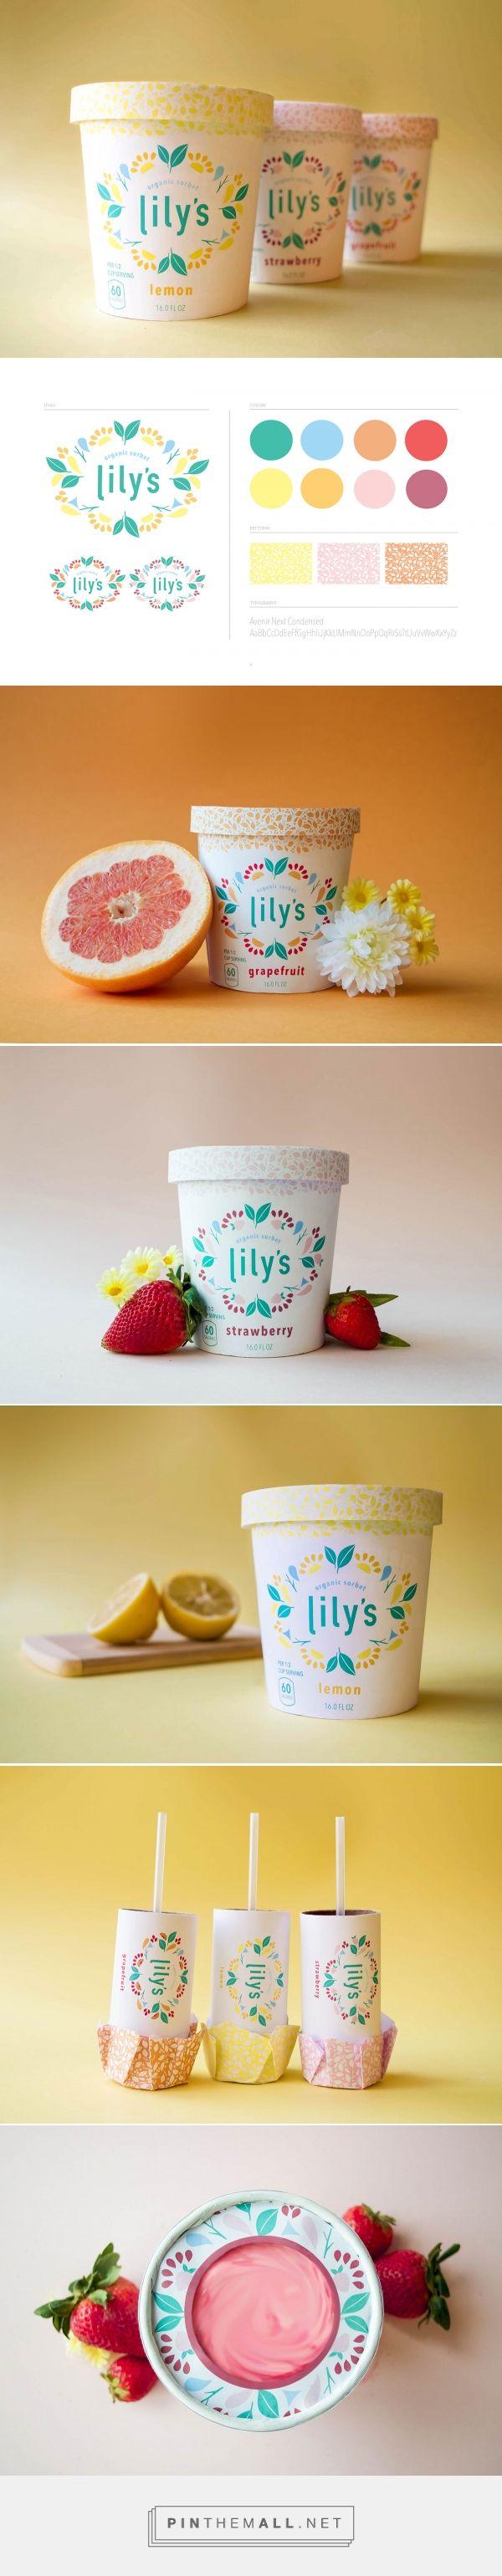 Lily's Organic Sorbet by Emma Dahlgren